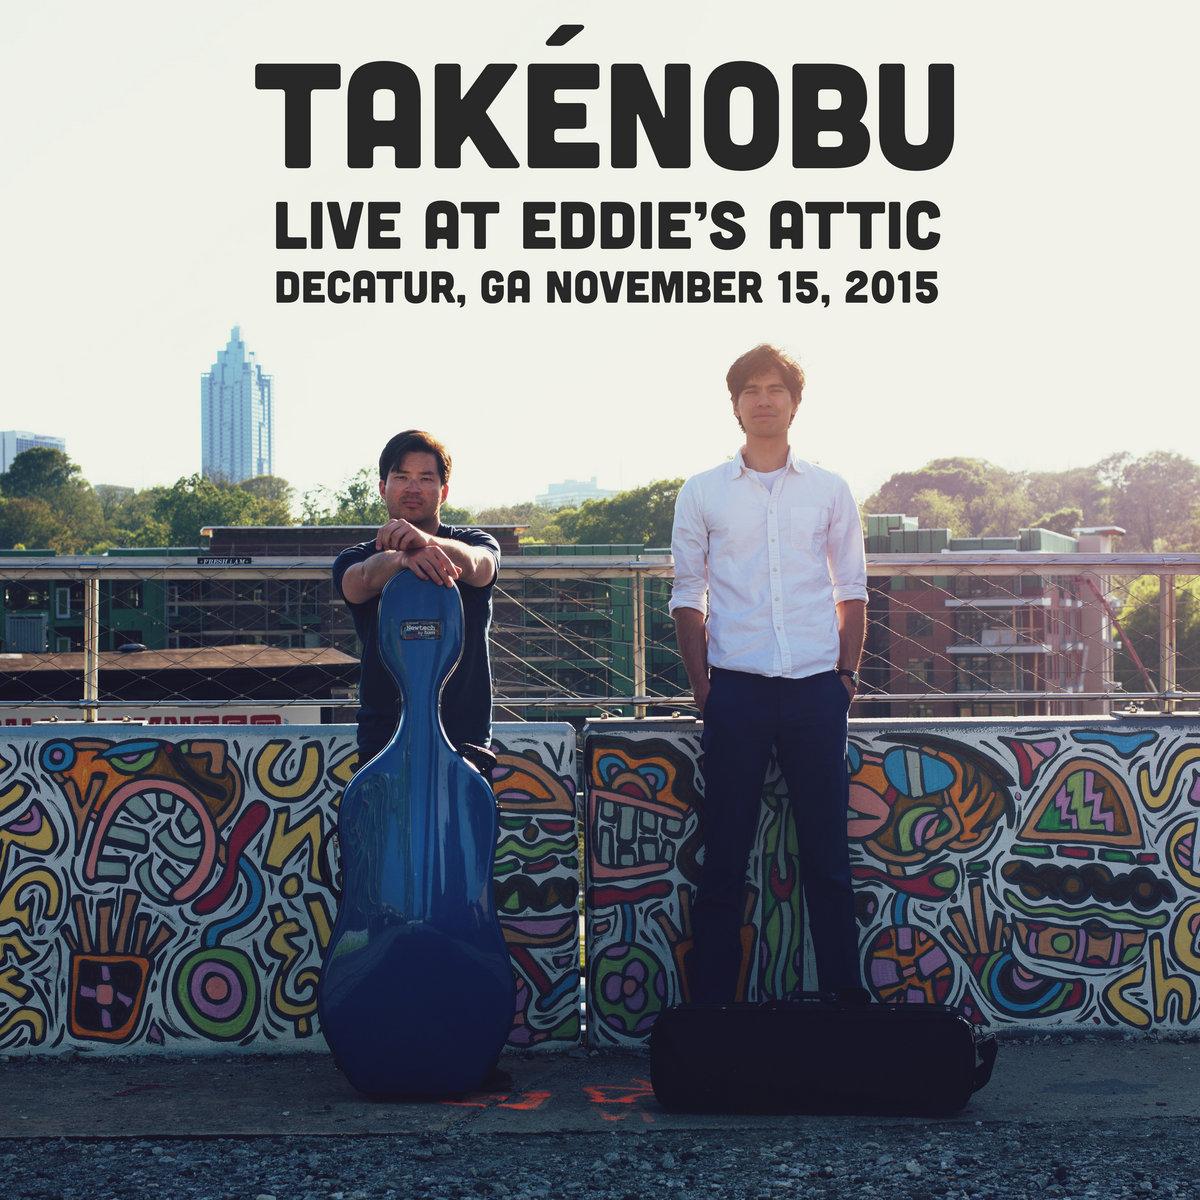 takenobu exposition mp3